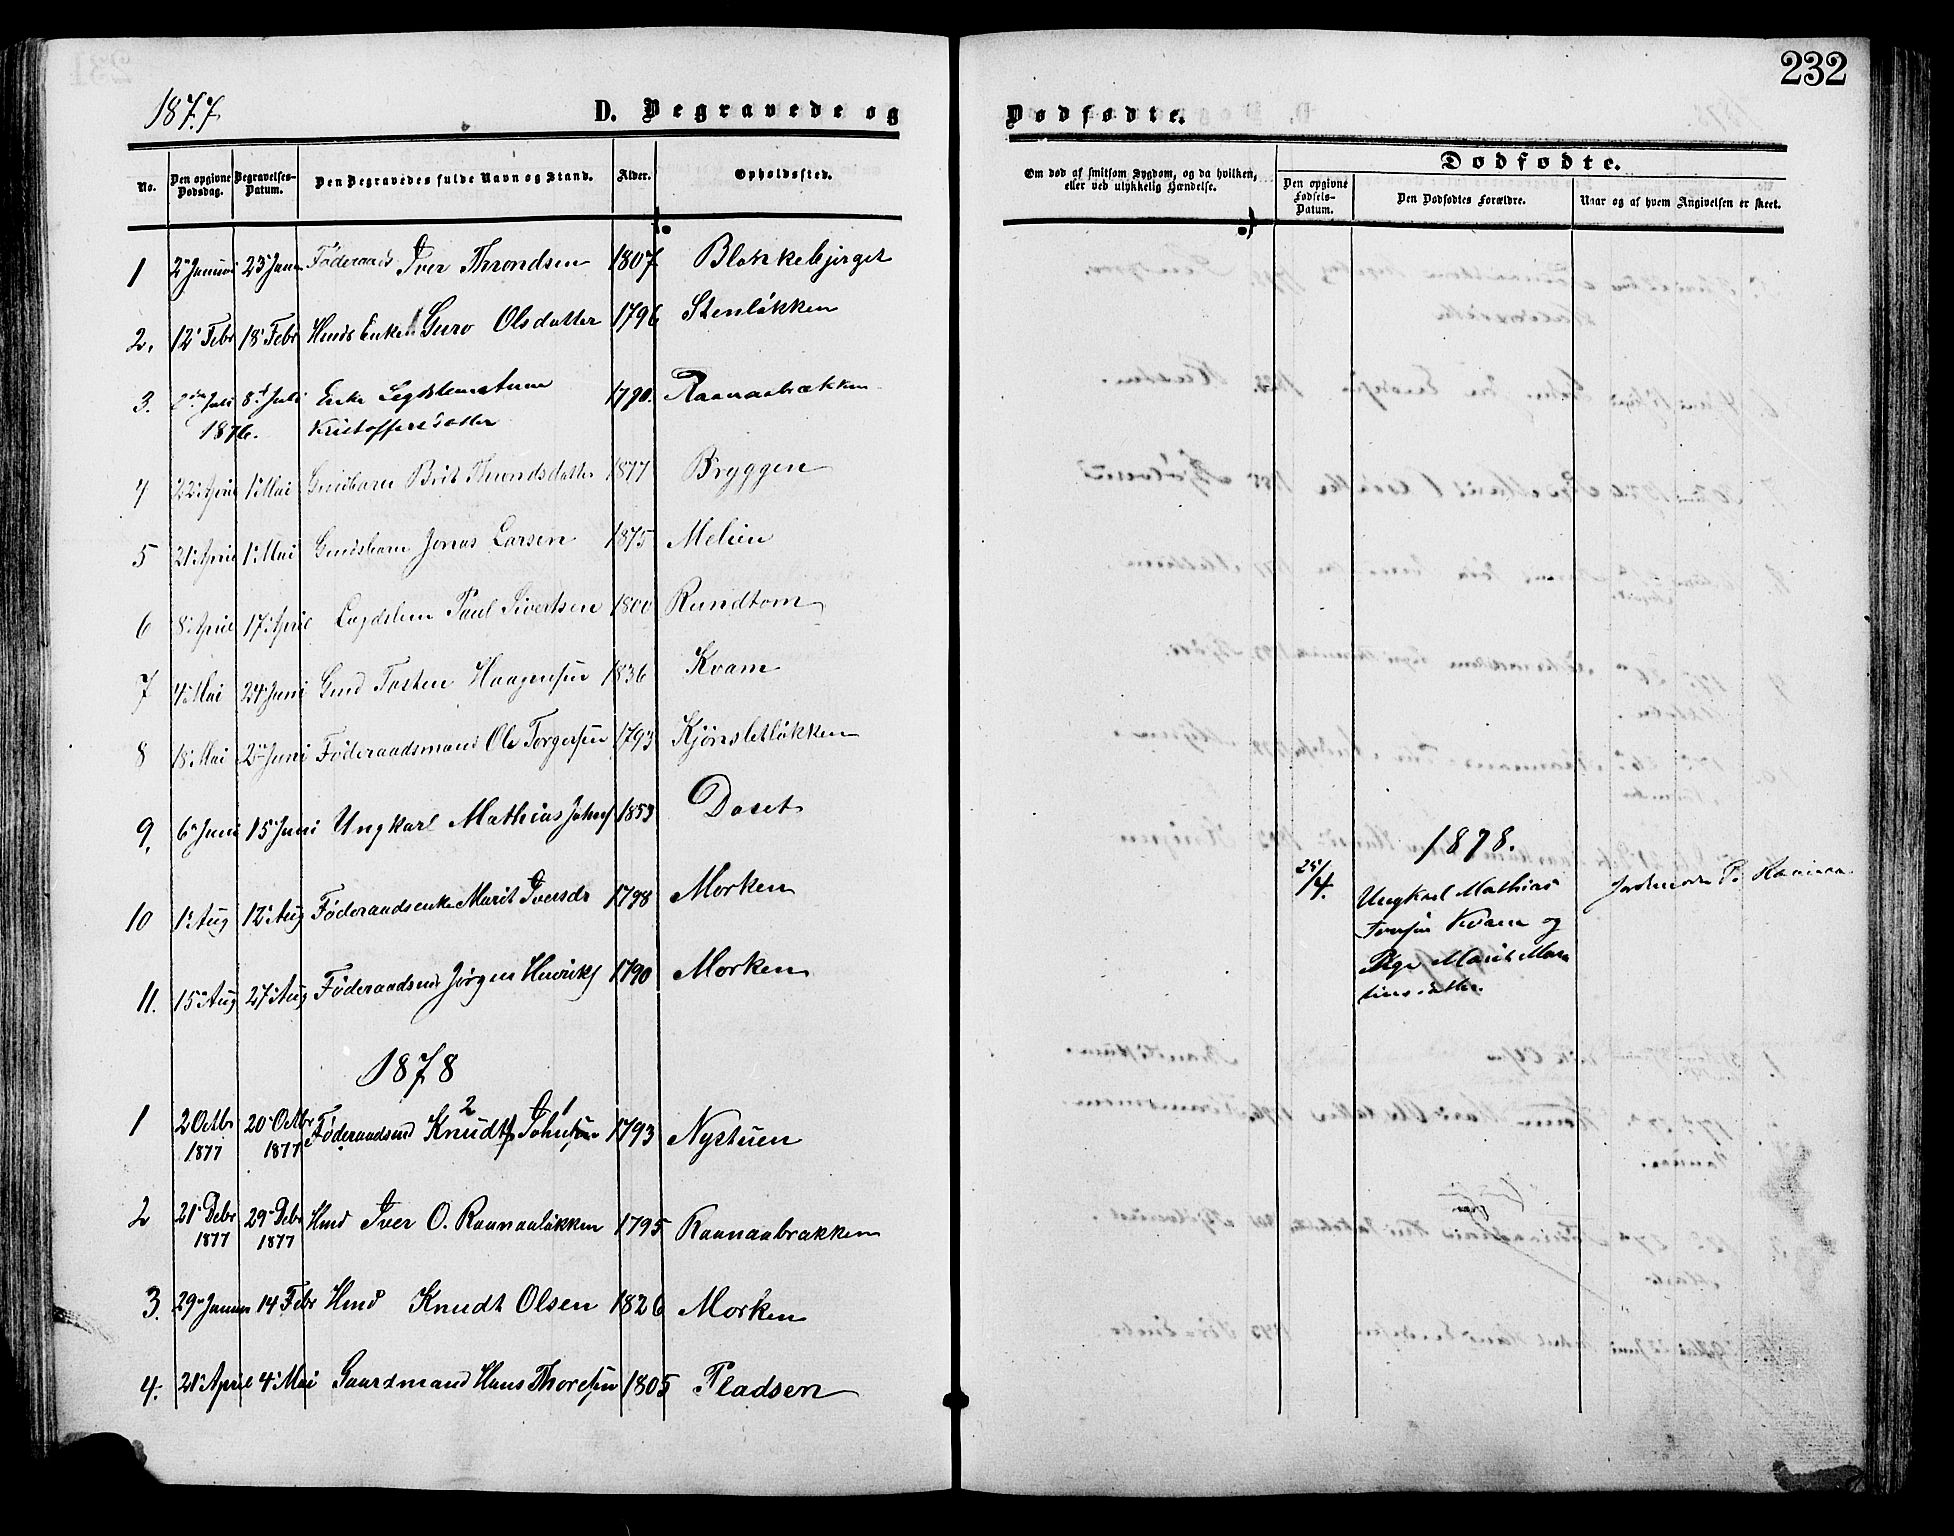 SAH, Lesja prestekontor, Ministerialbok nr. 9, 1854-1889, s. 232